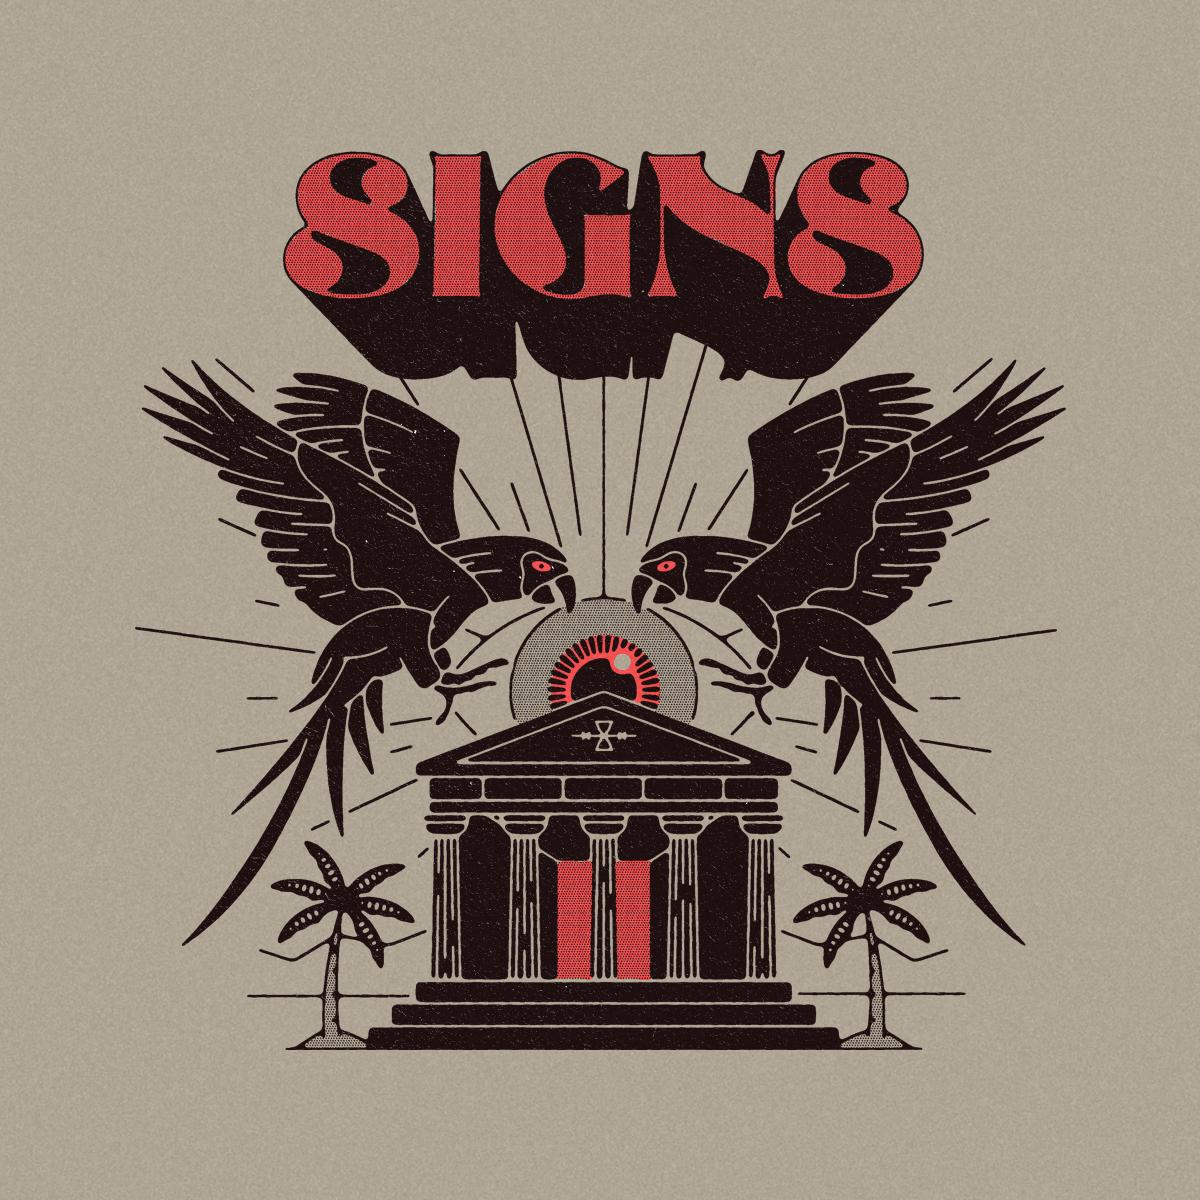 TBS_Signs_Insta